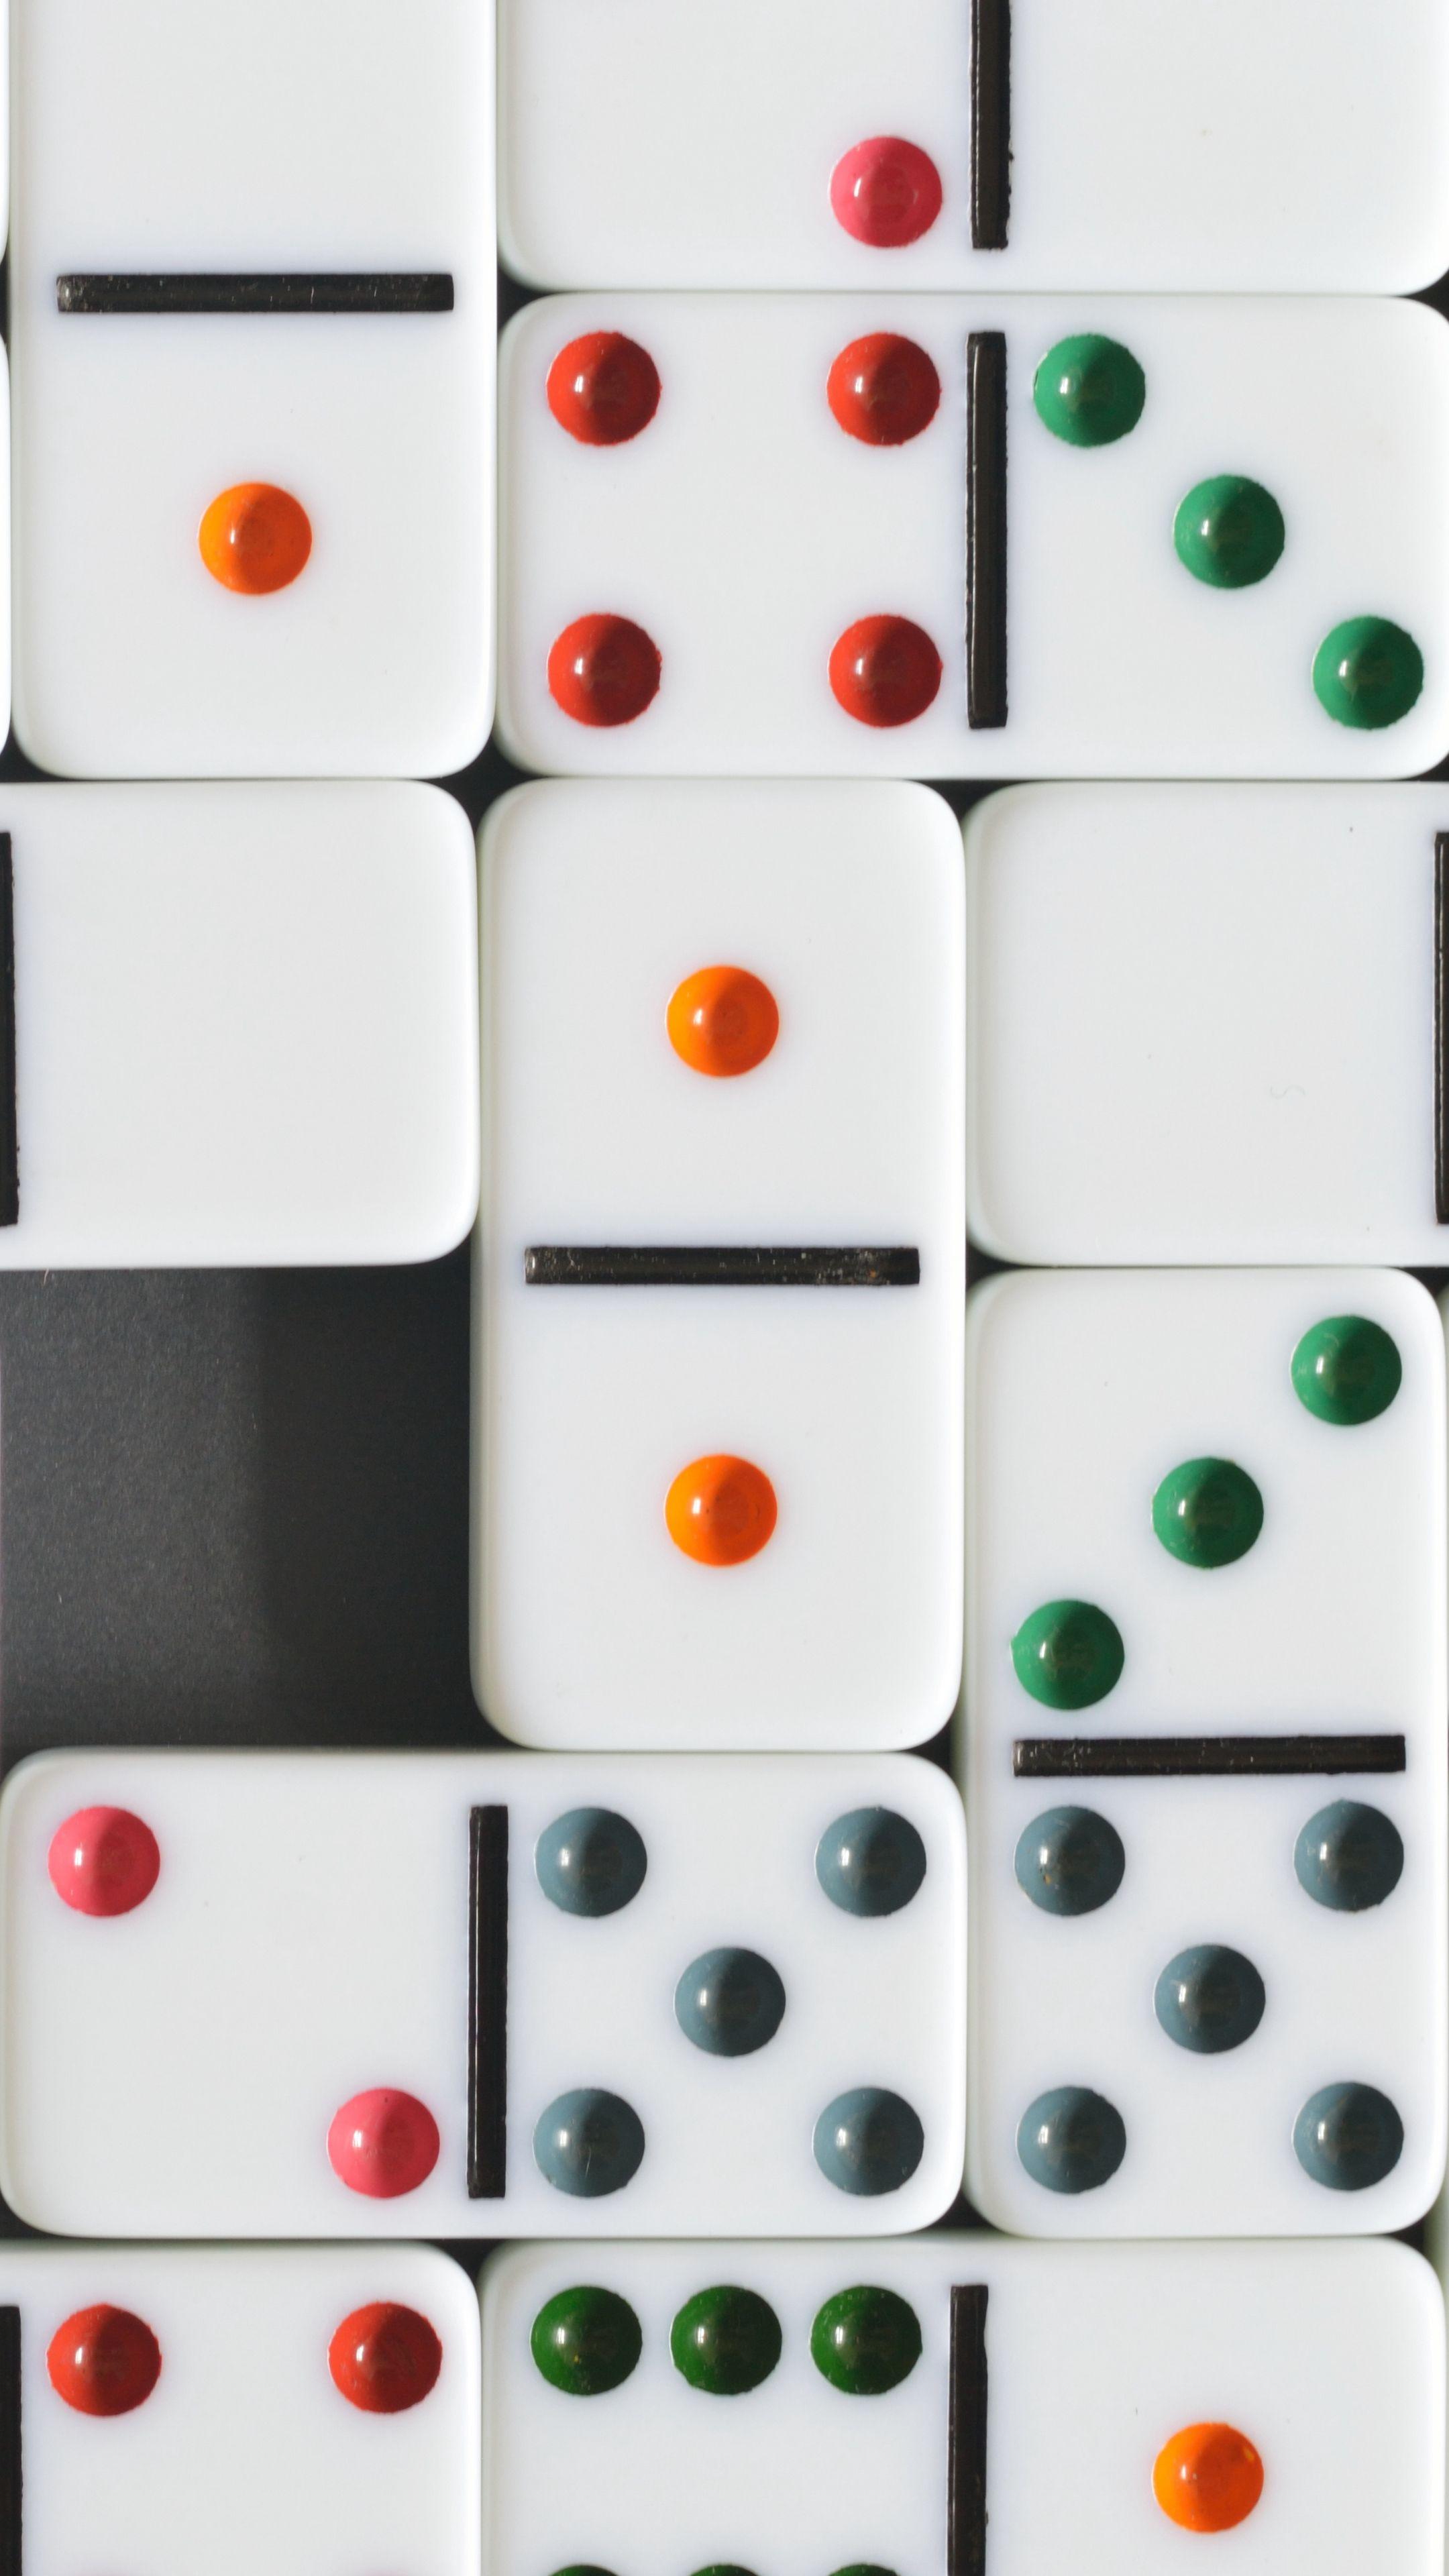 Misc dominoes dice board games wallpapers wallpaper